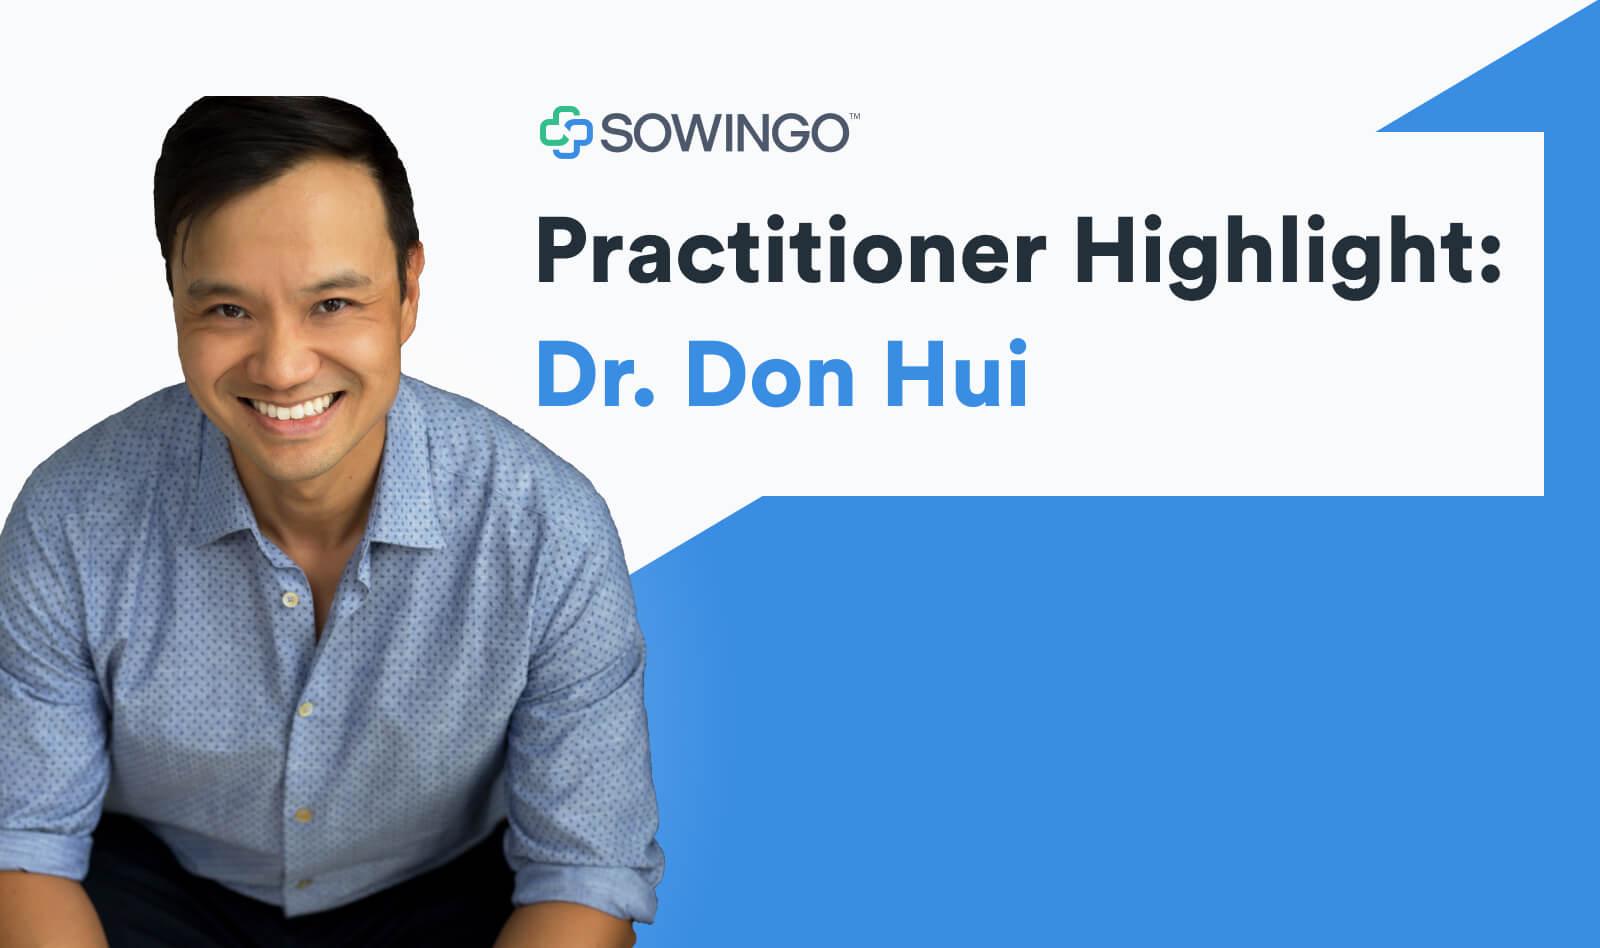 practitioner highlight: dr. don hui